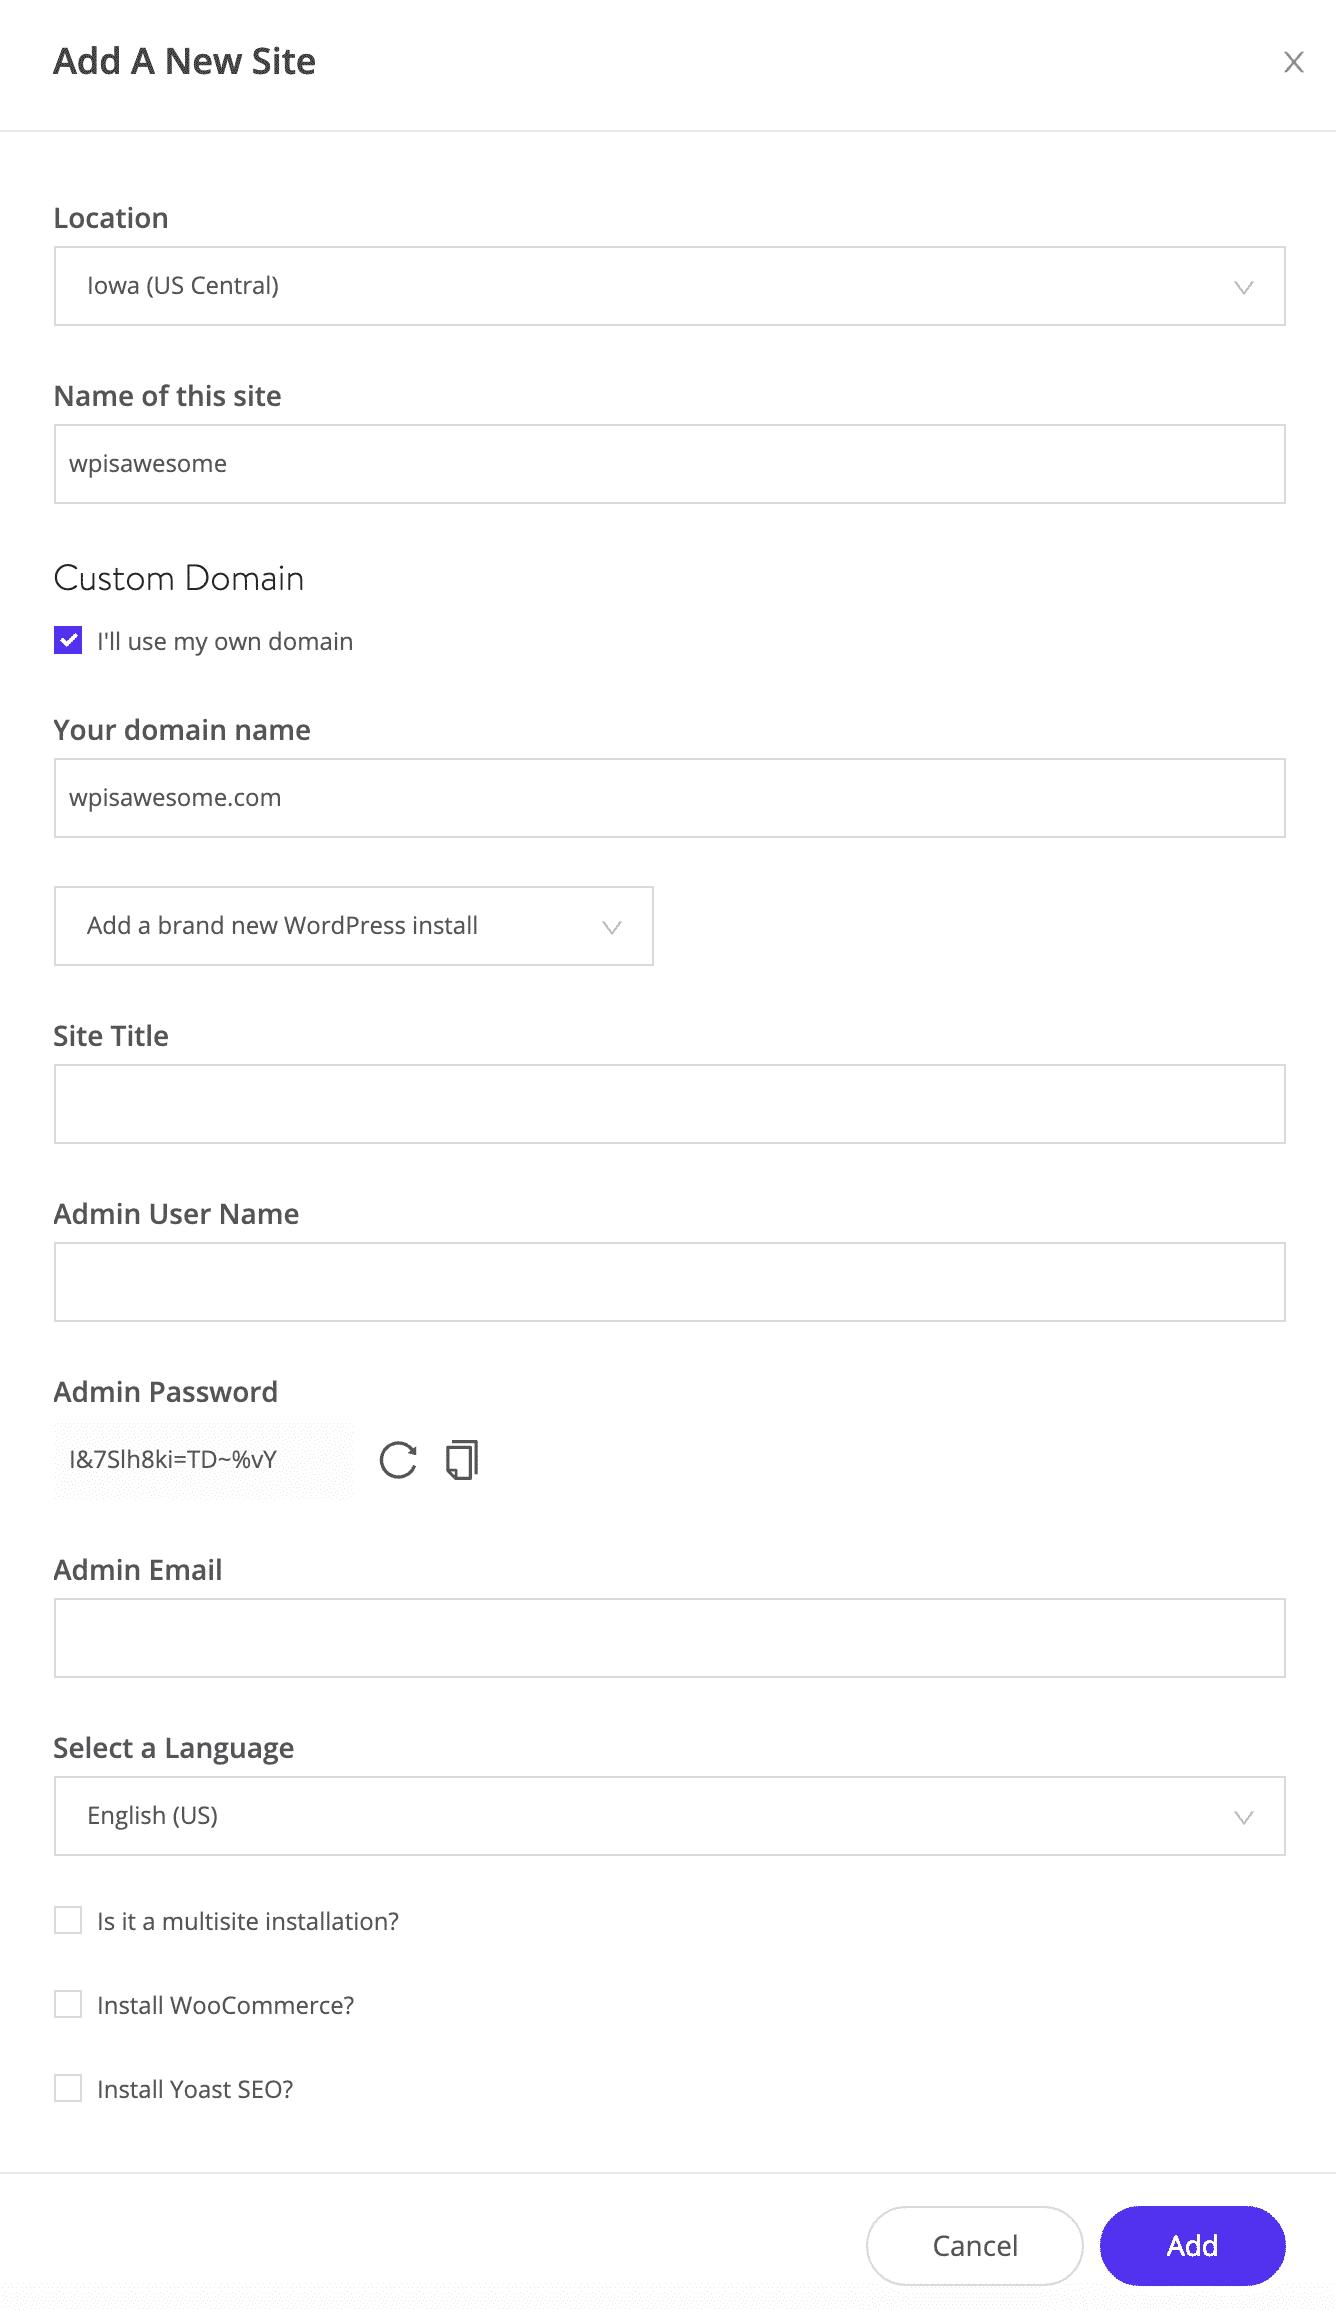 Installer WordPress en un seul clic